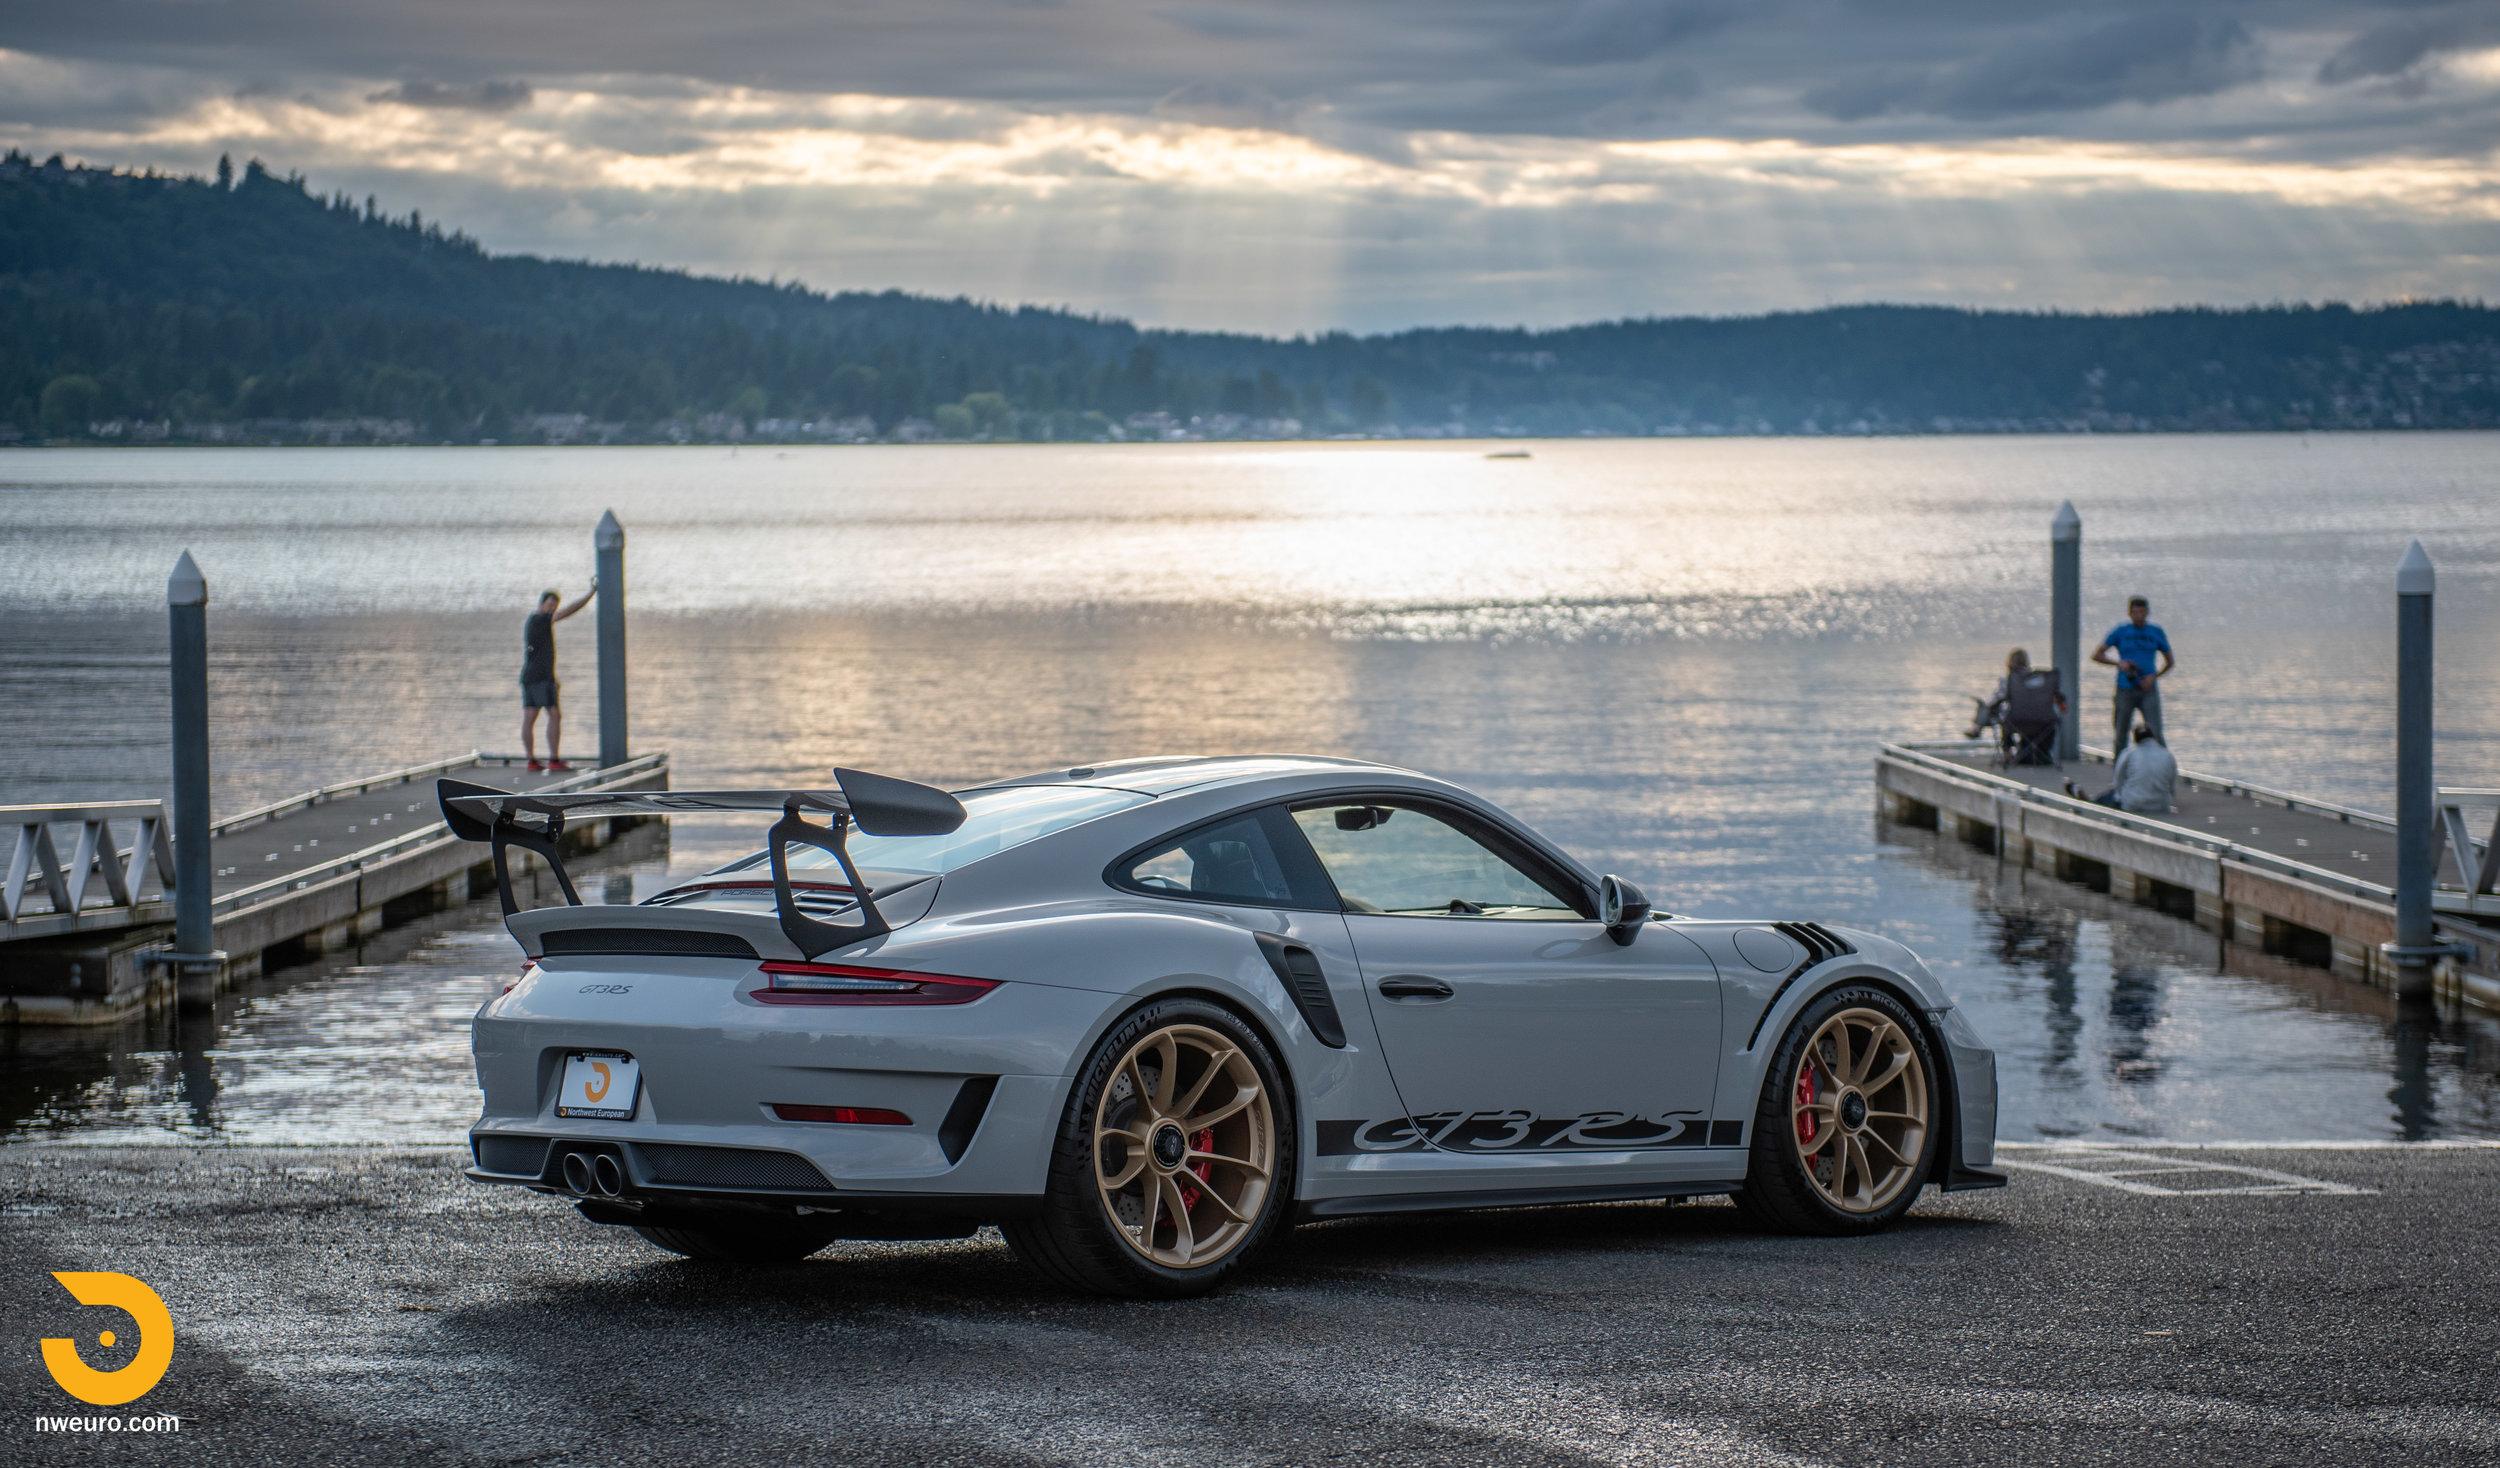 2019 Porsche GT3 RS - Chalk-77.jpg